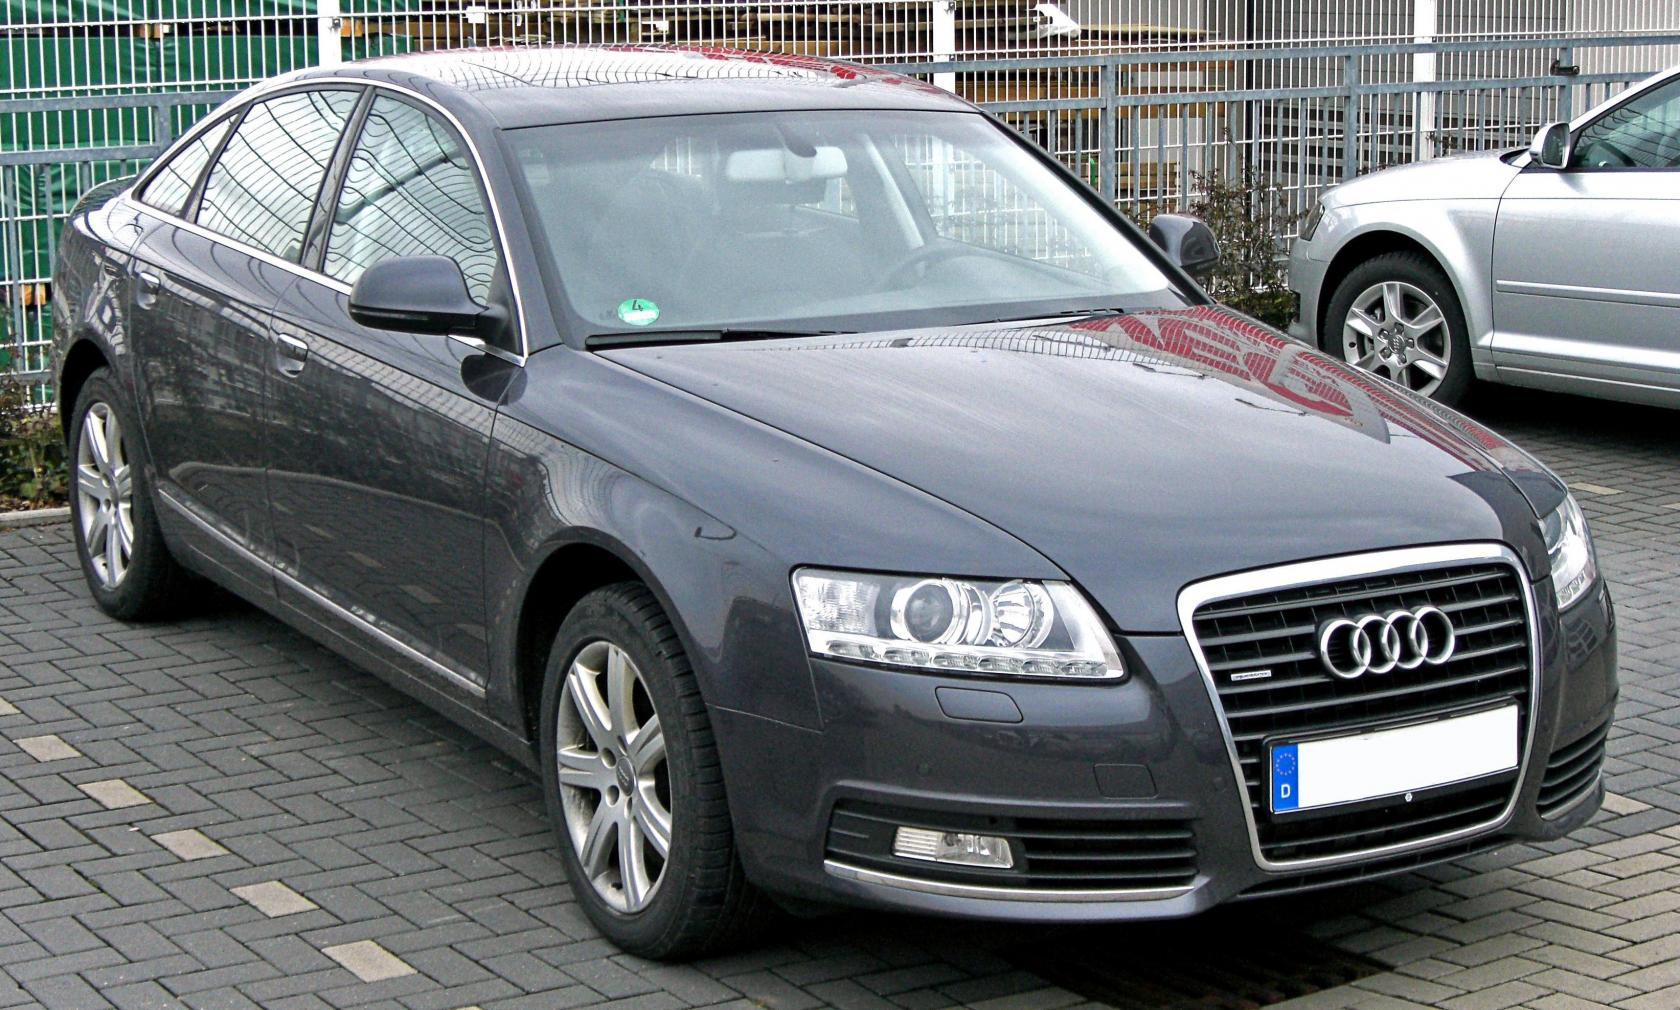 Audi-A6-C6-1